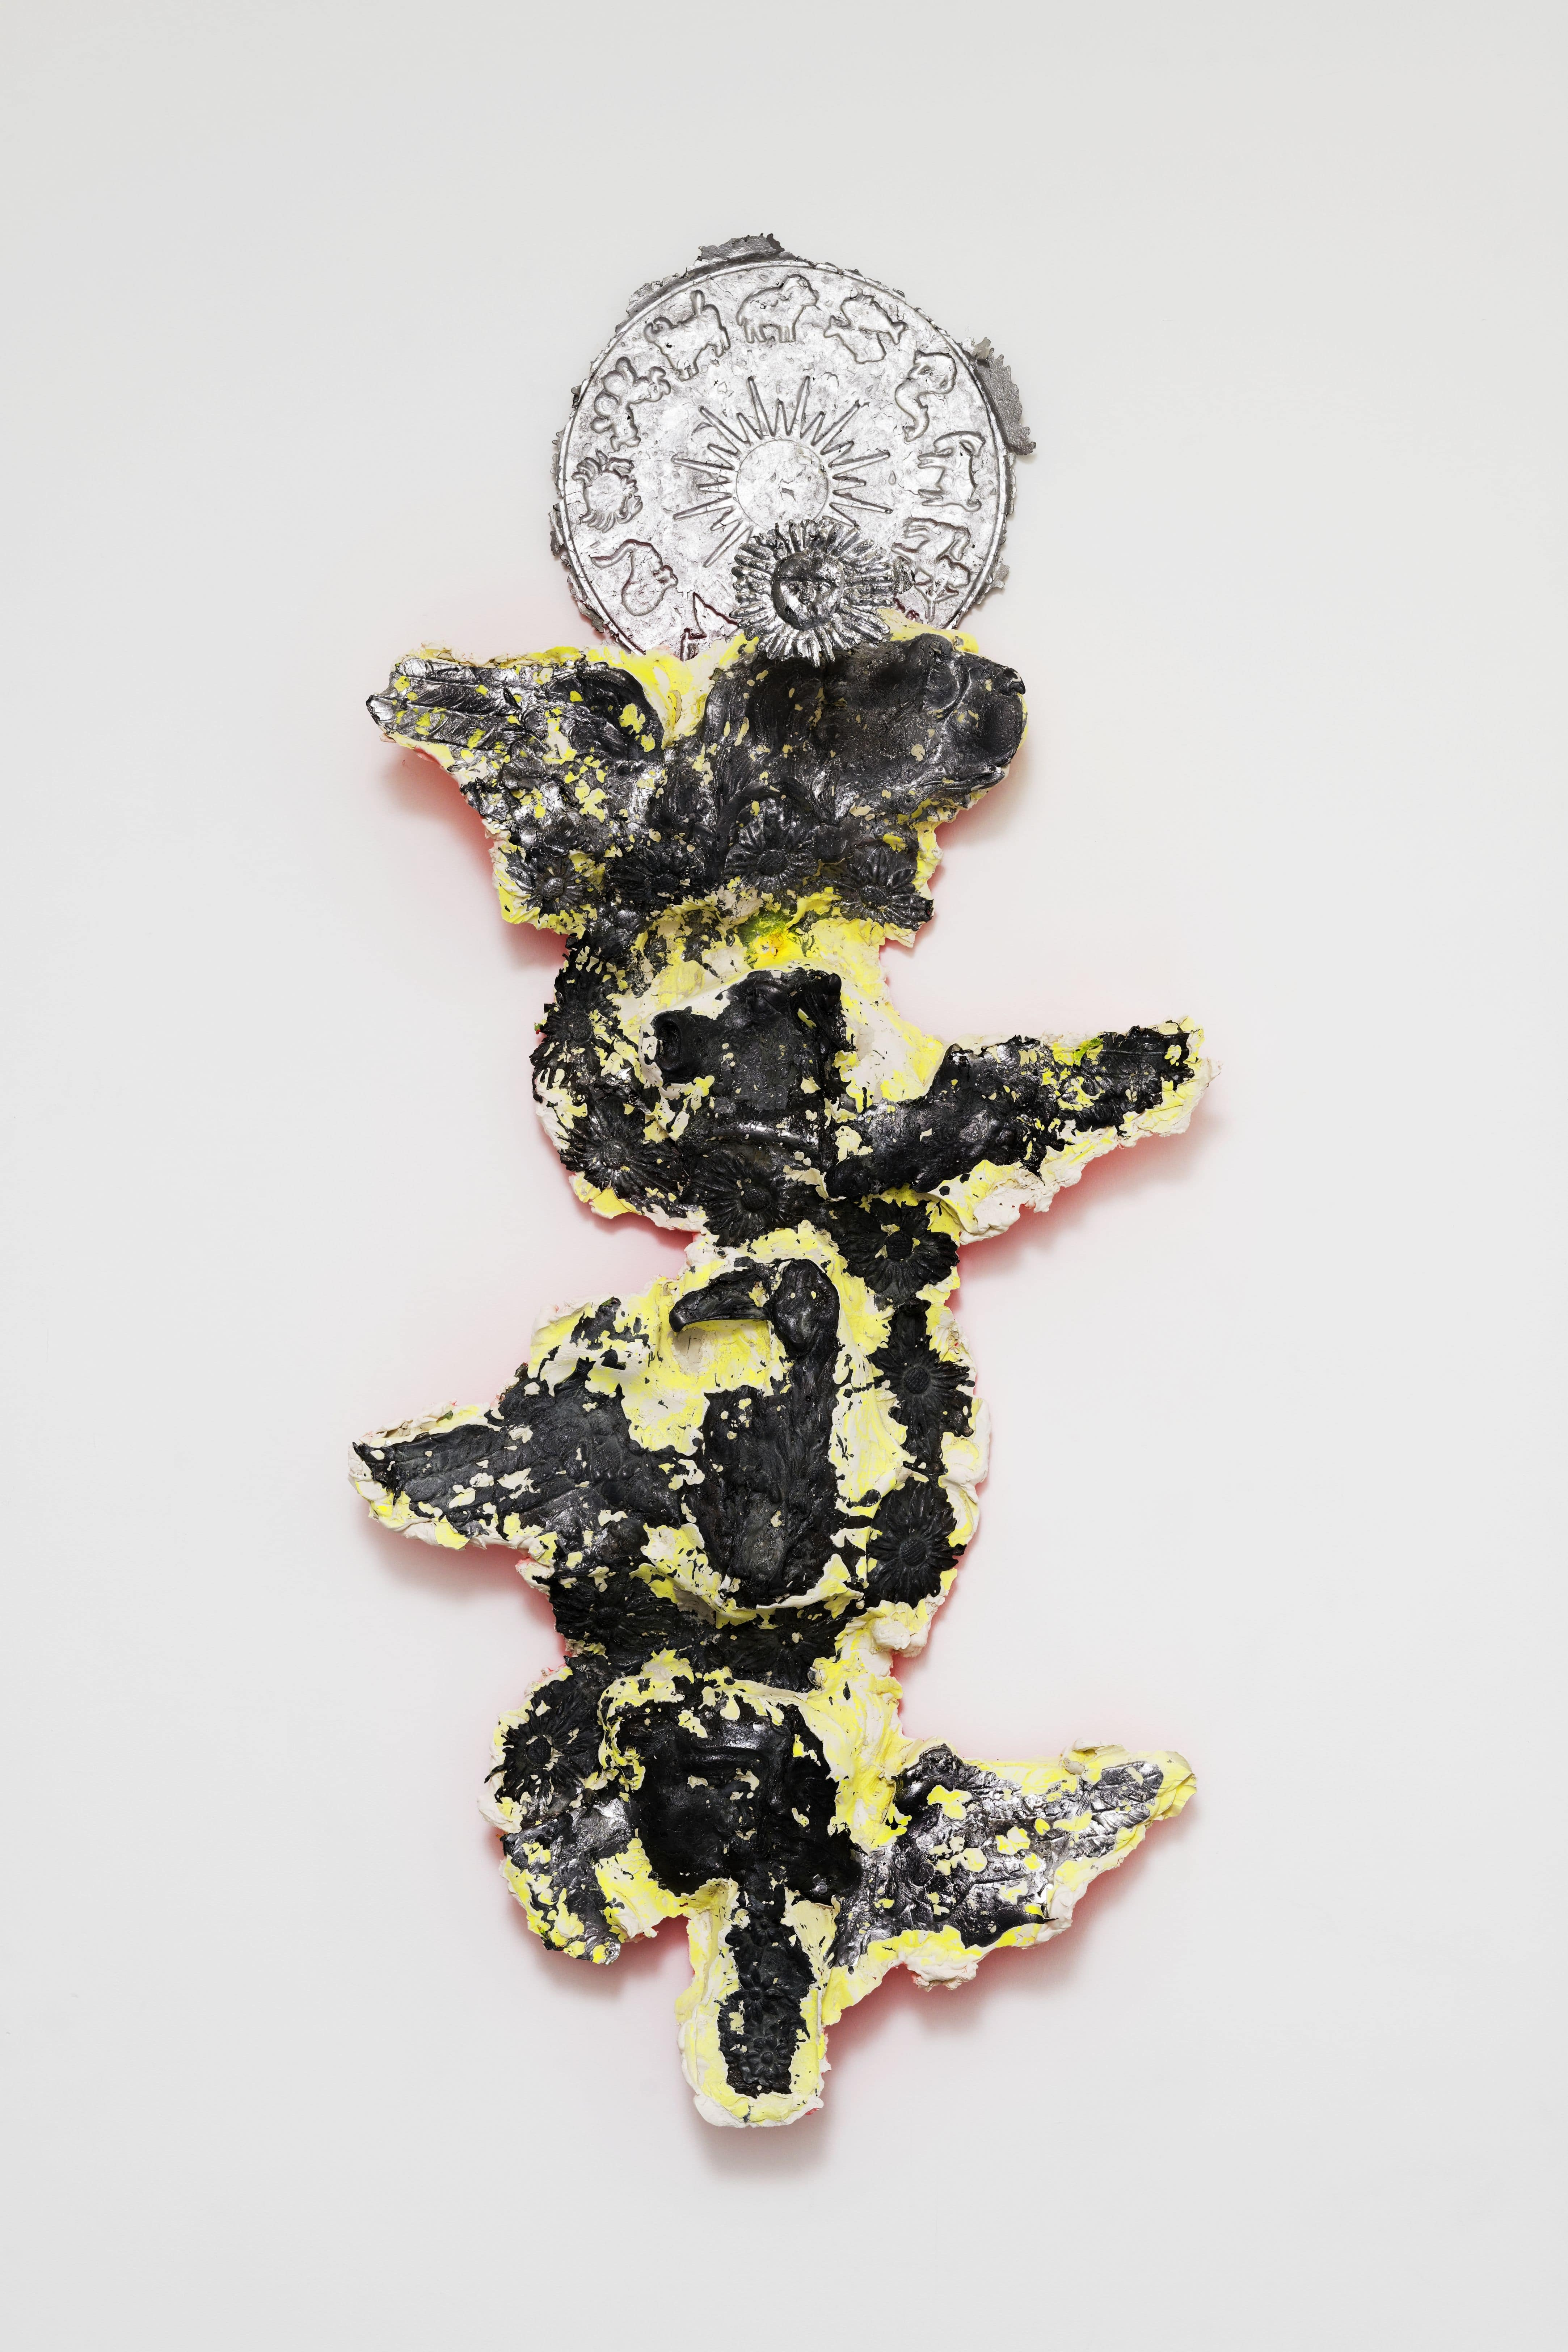 Jean Baptiste Janisset, Le Tétramorphe, 2019